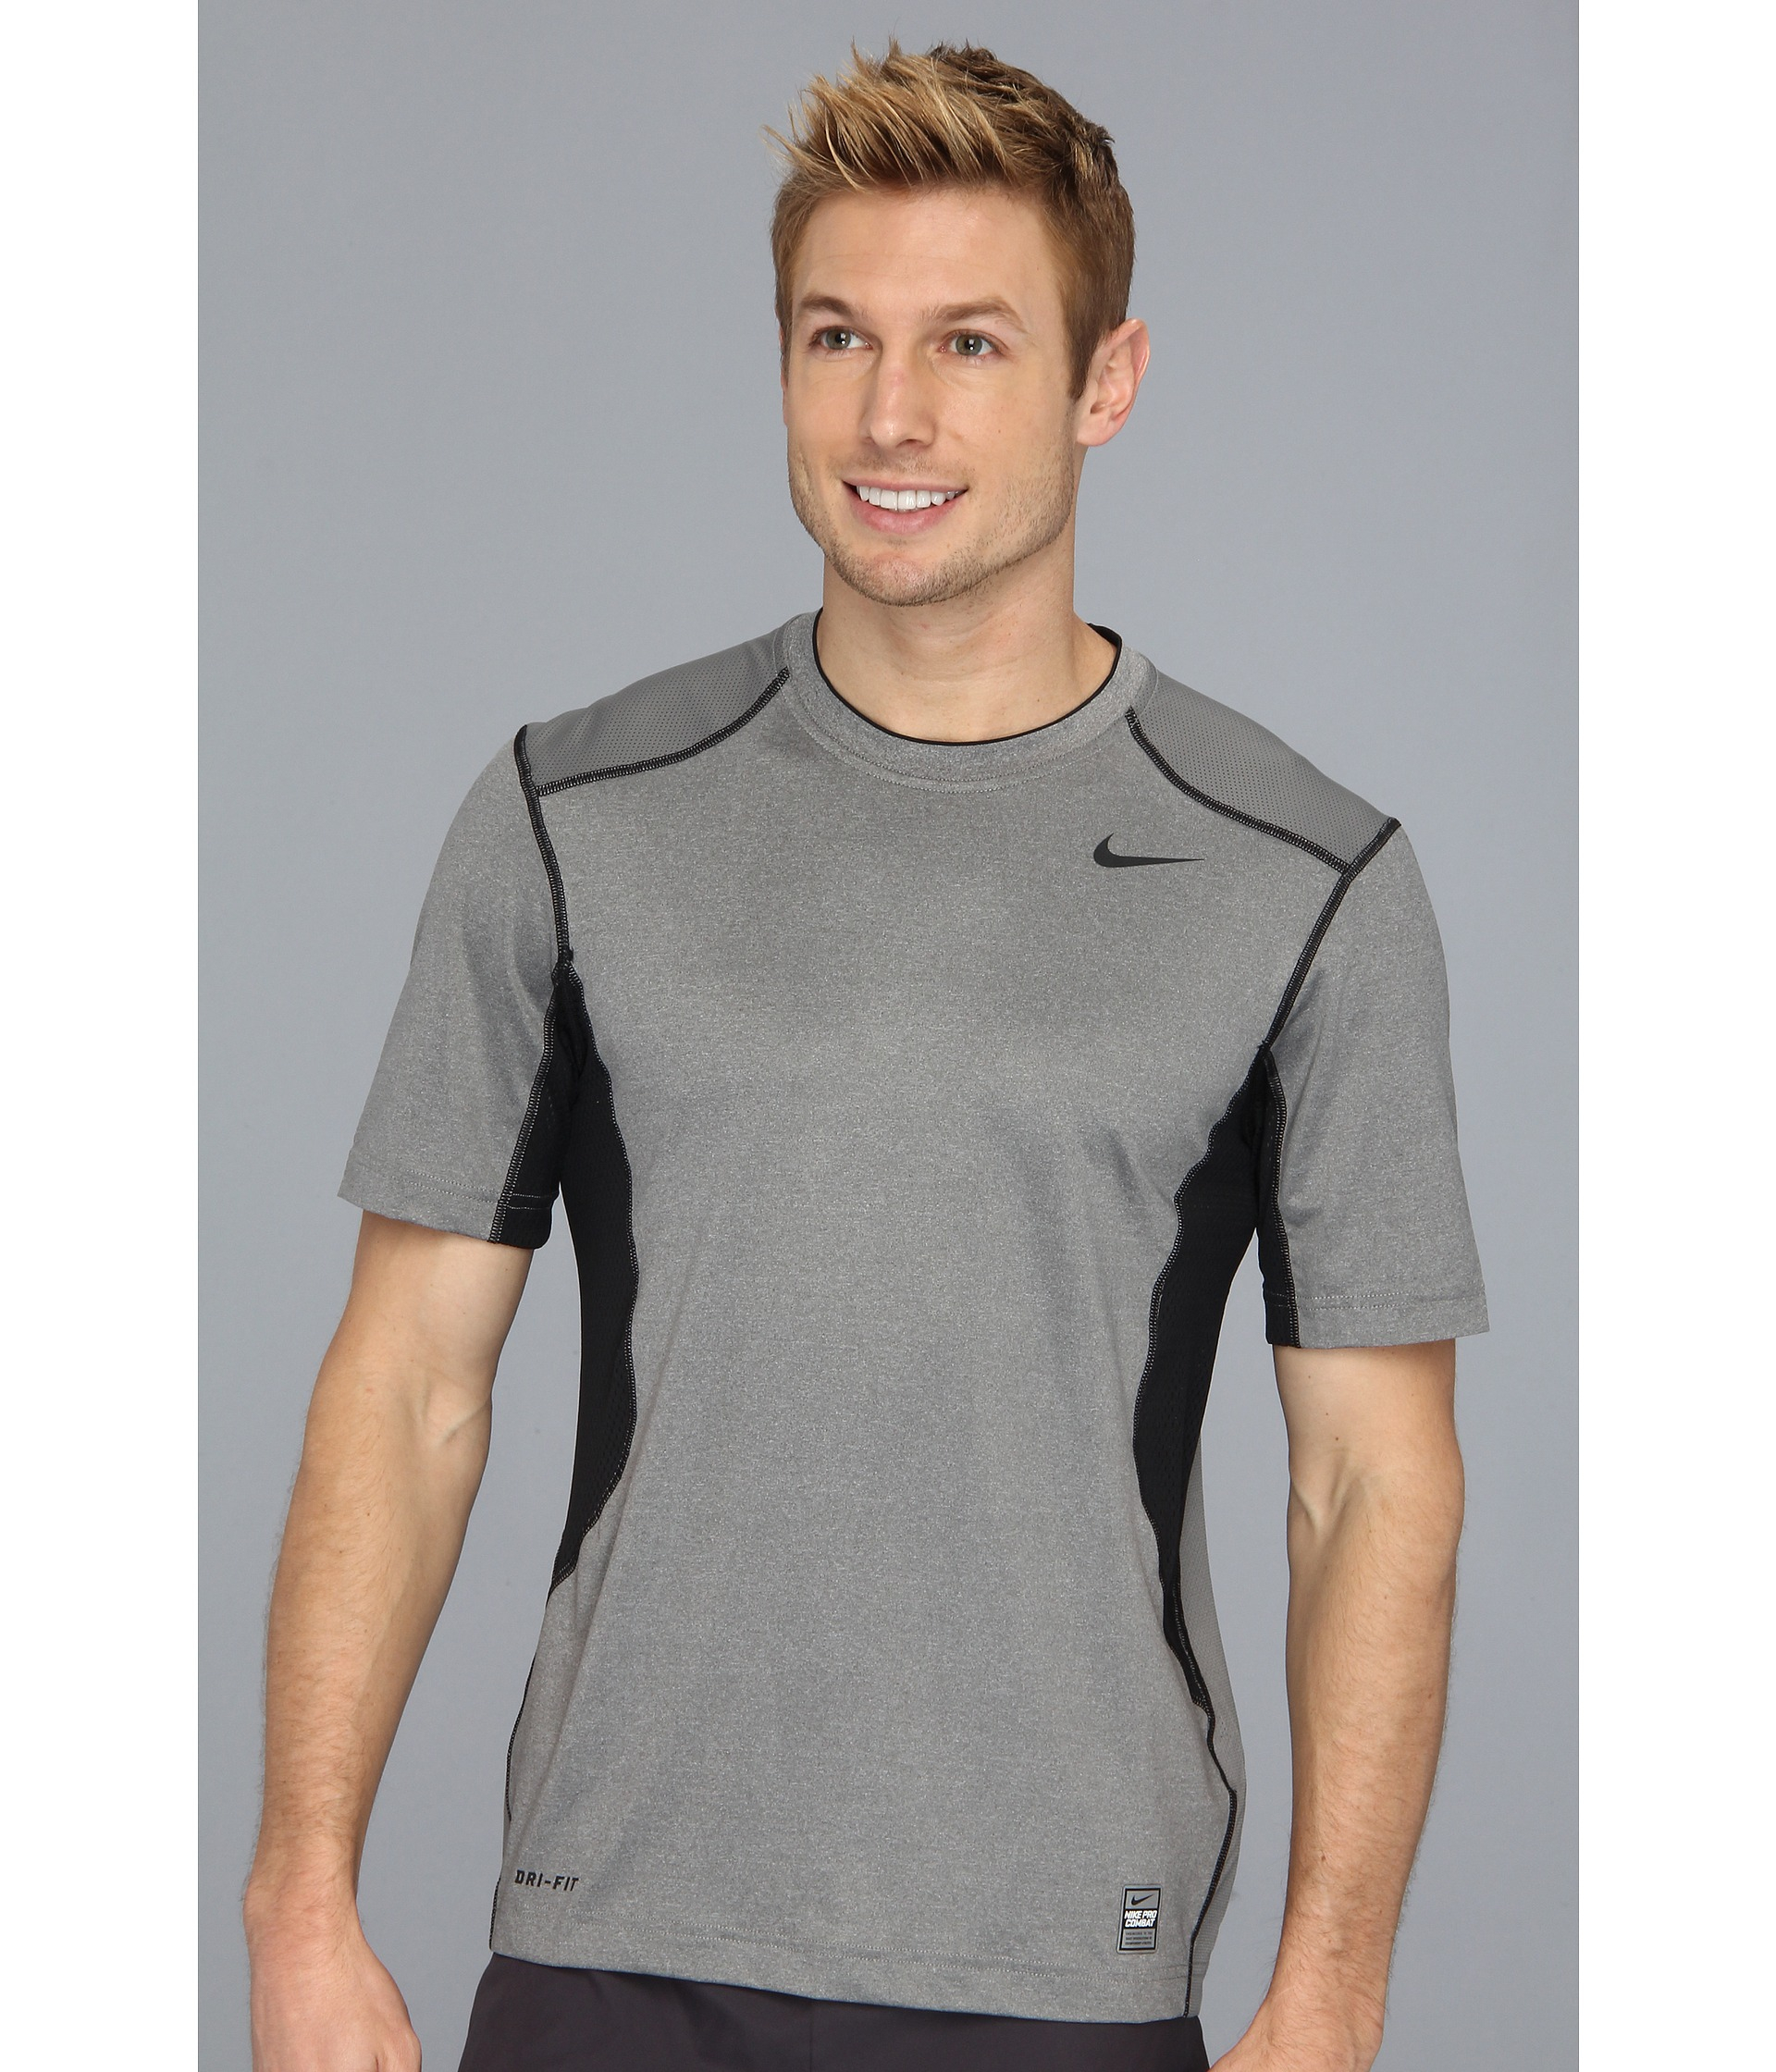 e63f755ff007 Nike Hypercool Long Sleeve T Shirt Mens - BCD Tofu House